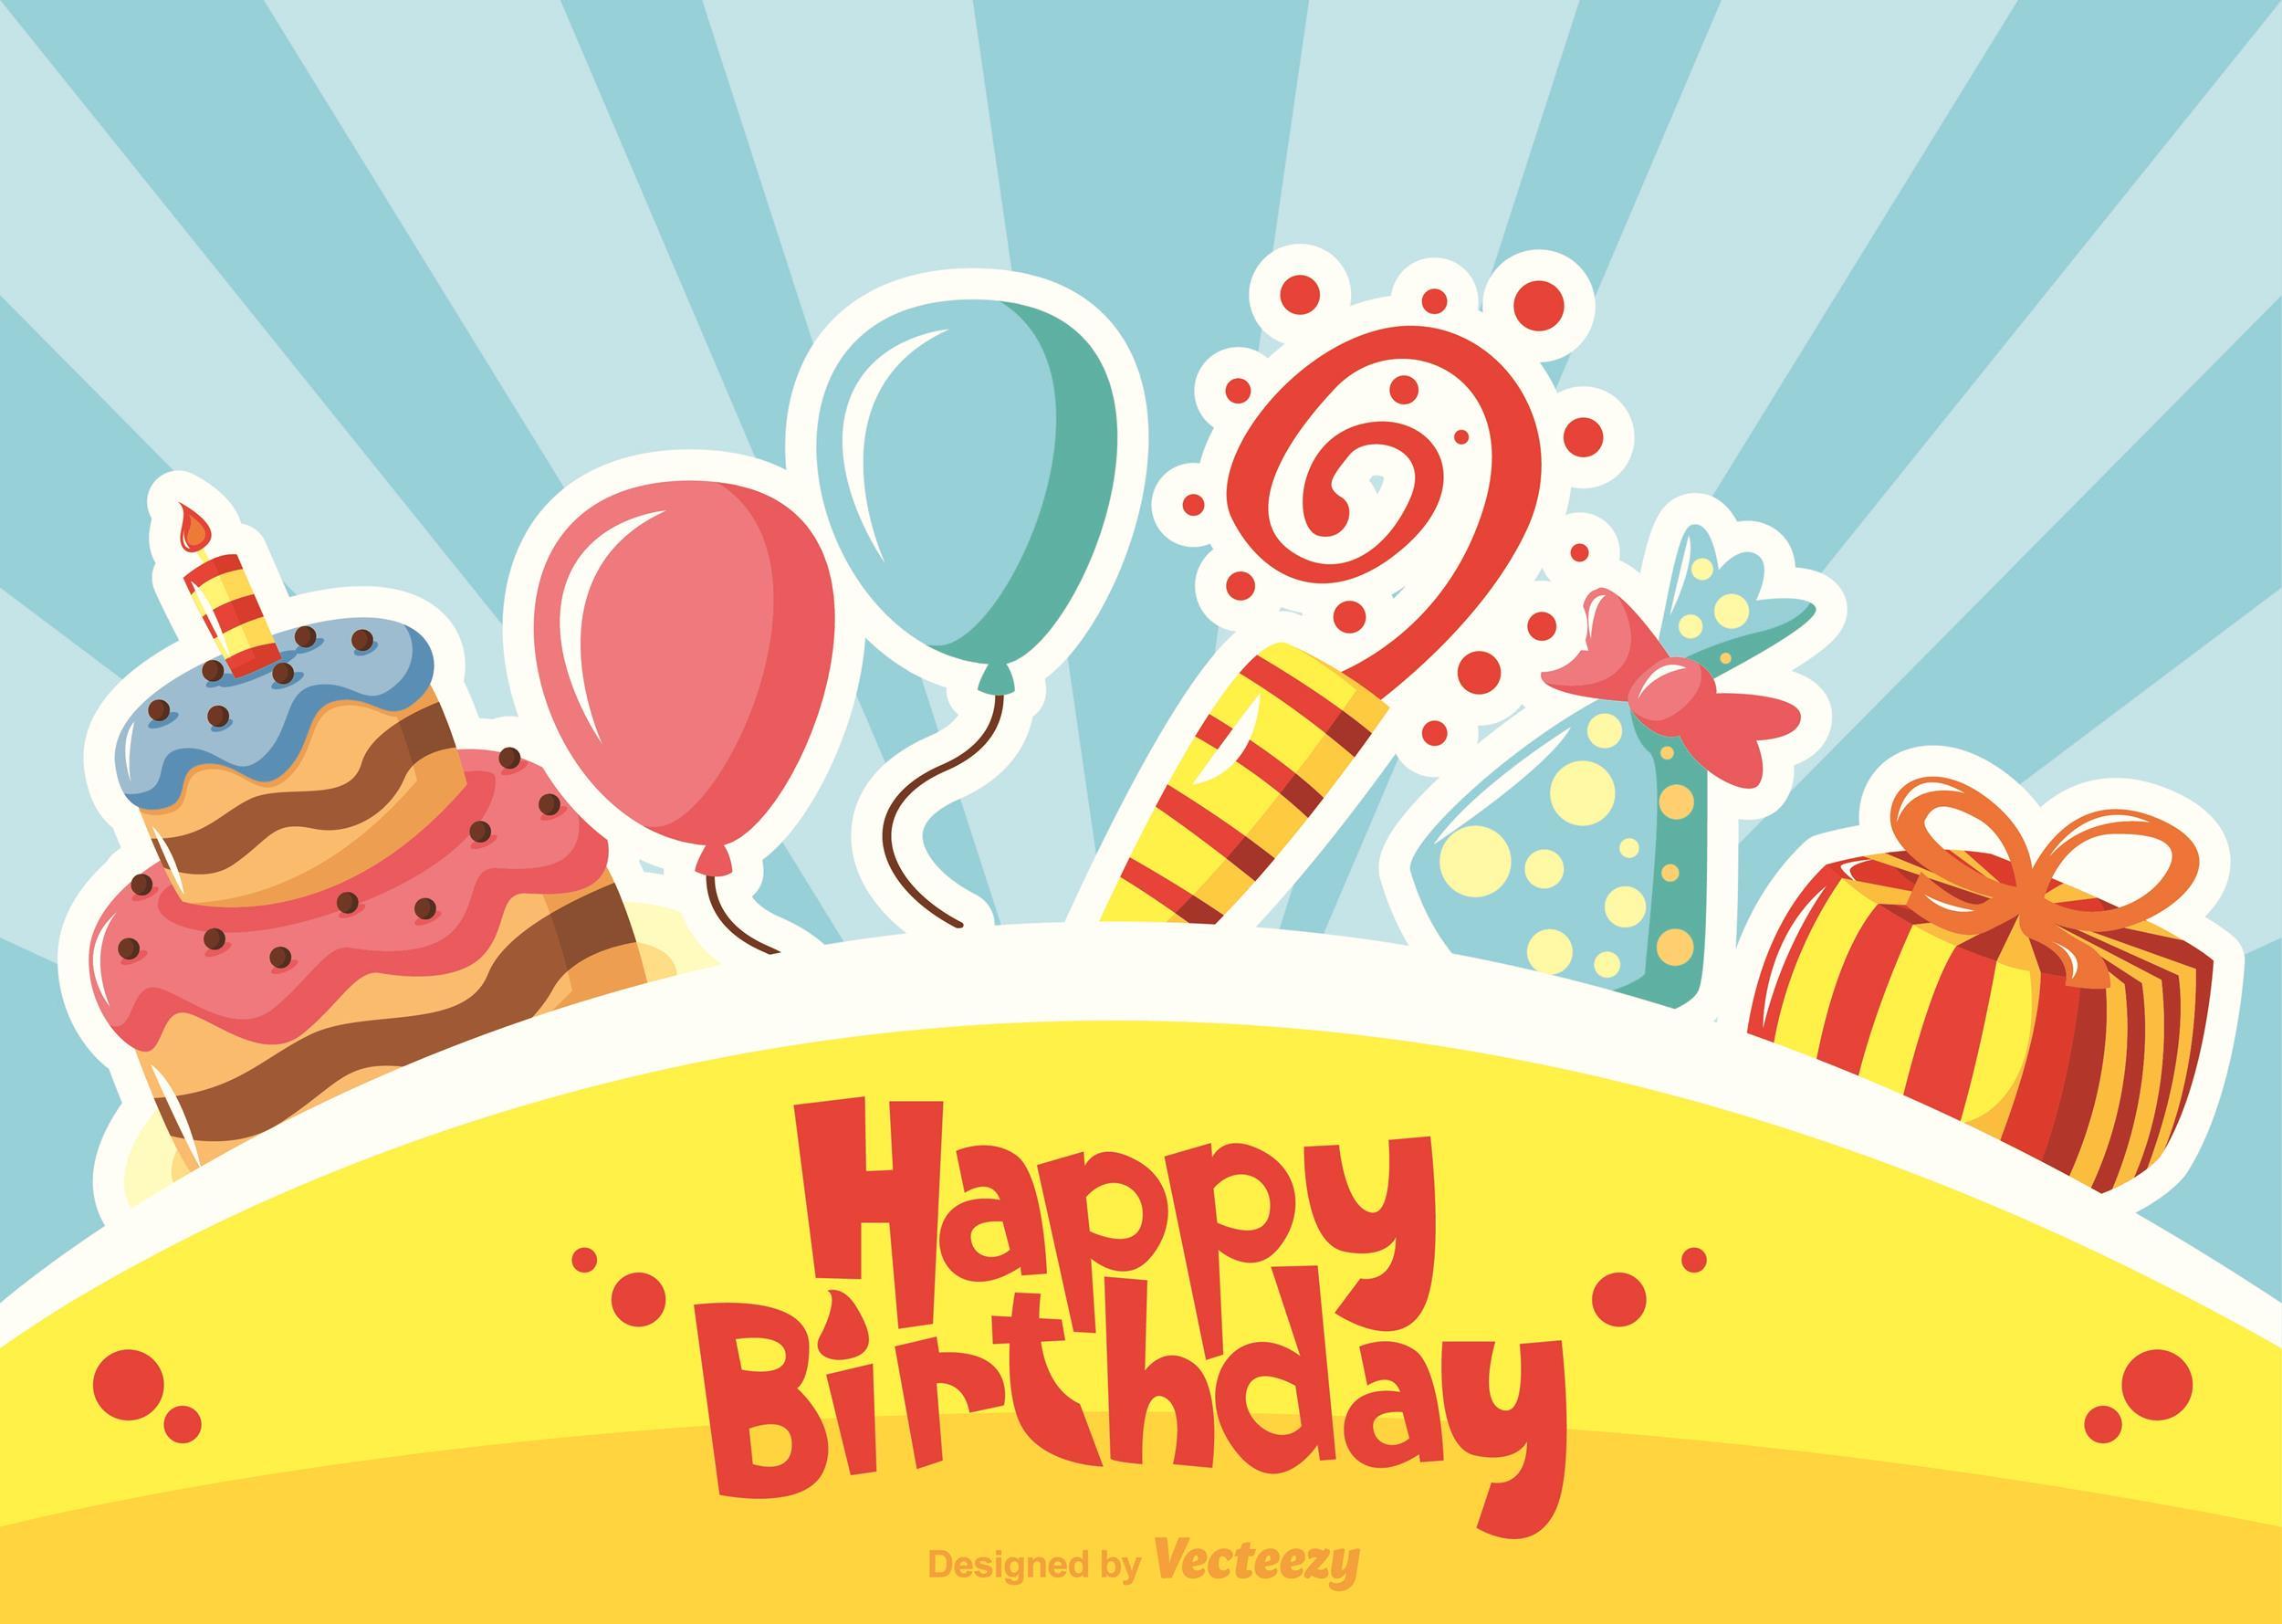 Free birthday card template 03